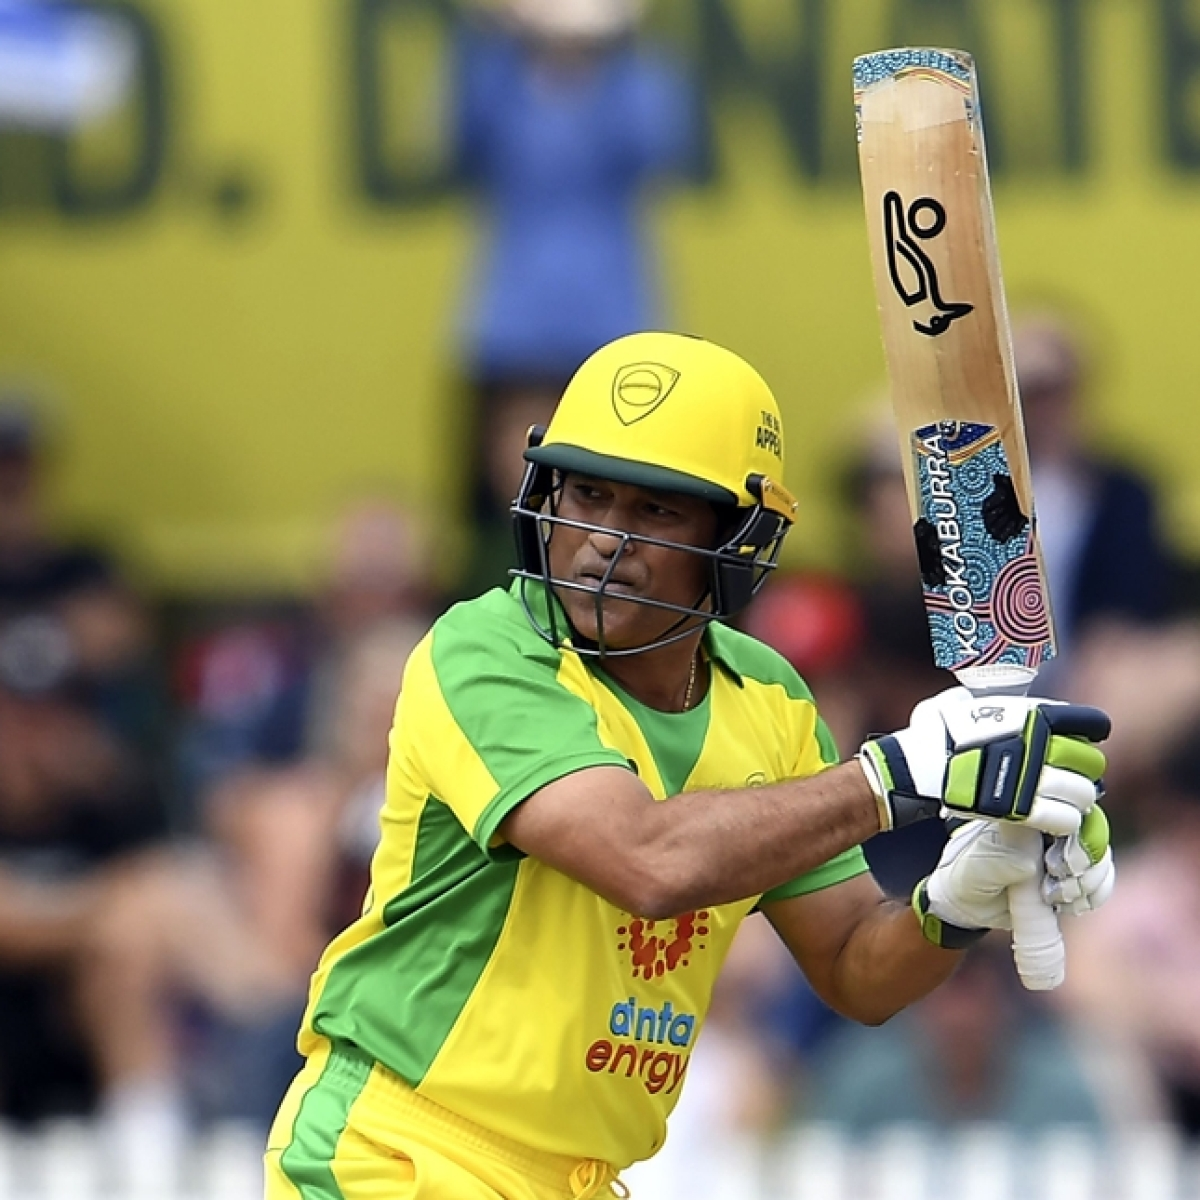 First in 5 years: Sachin Tendulkar takes the bat once again